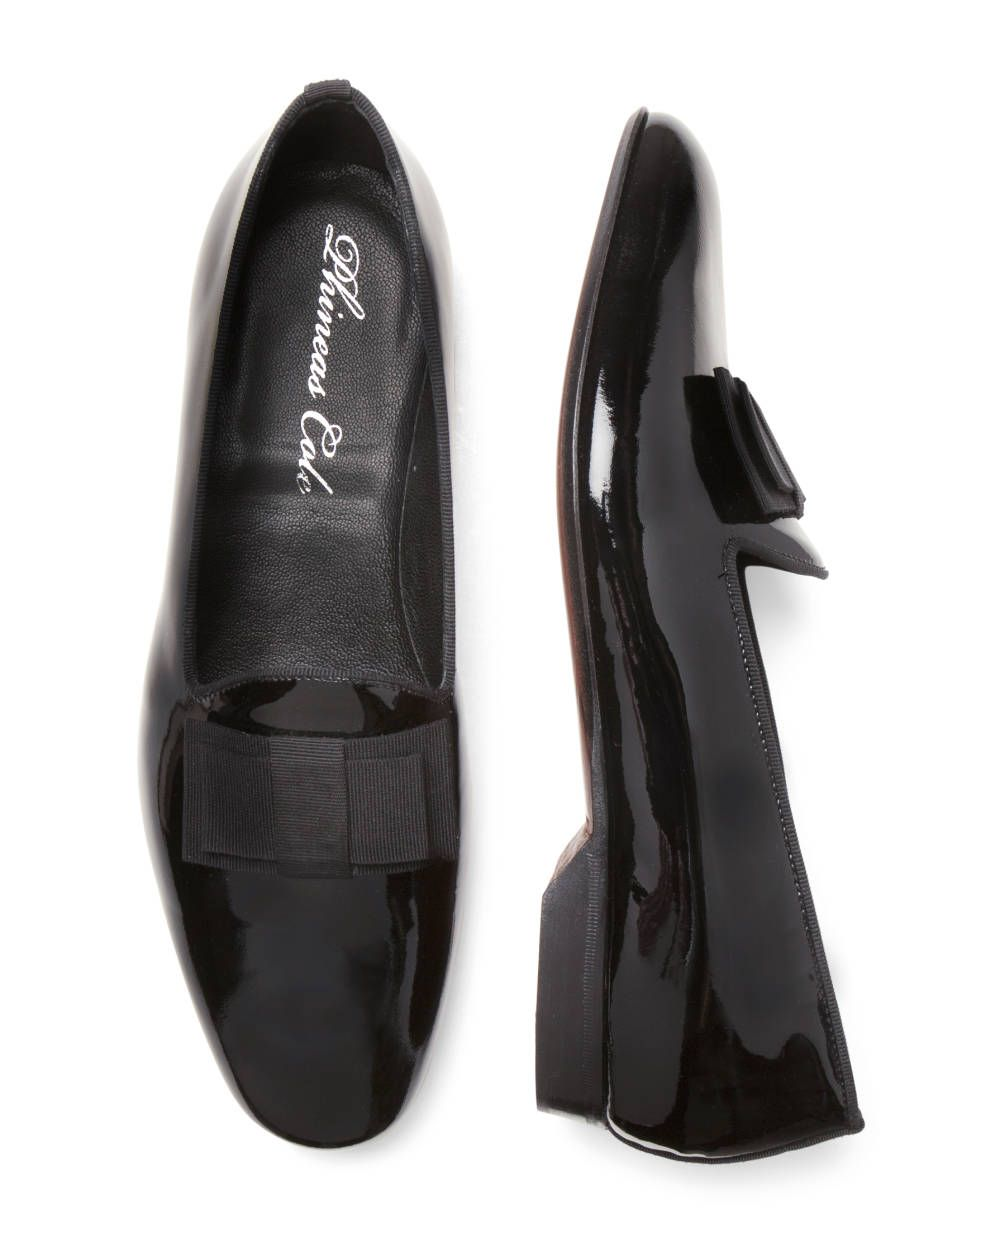 1c39a09f721 Grooms Shoes  Mens Wedding Shoes - Phineas Cole for Paul Stuart